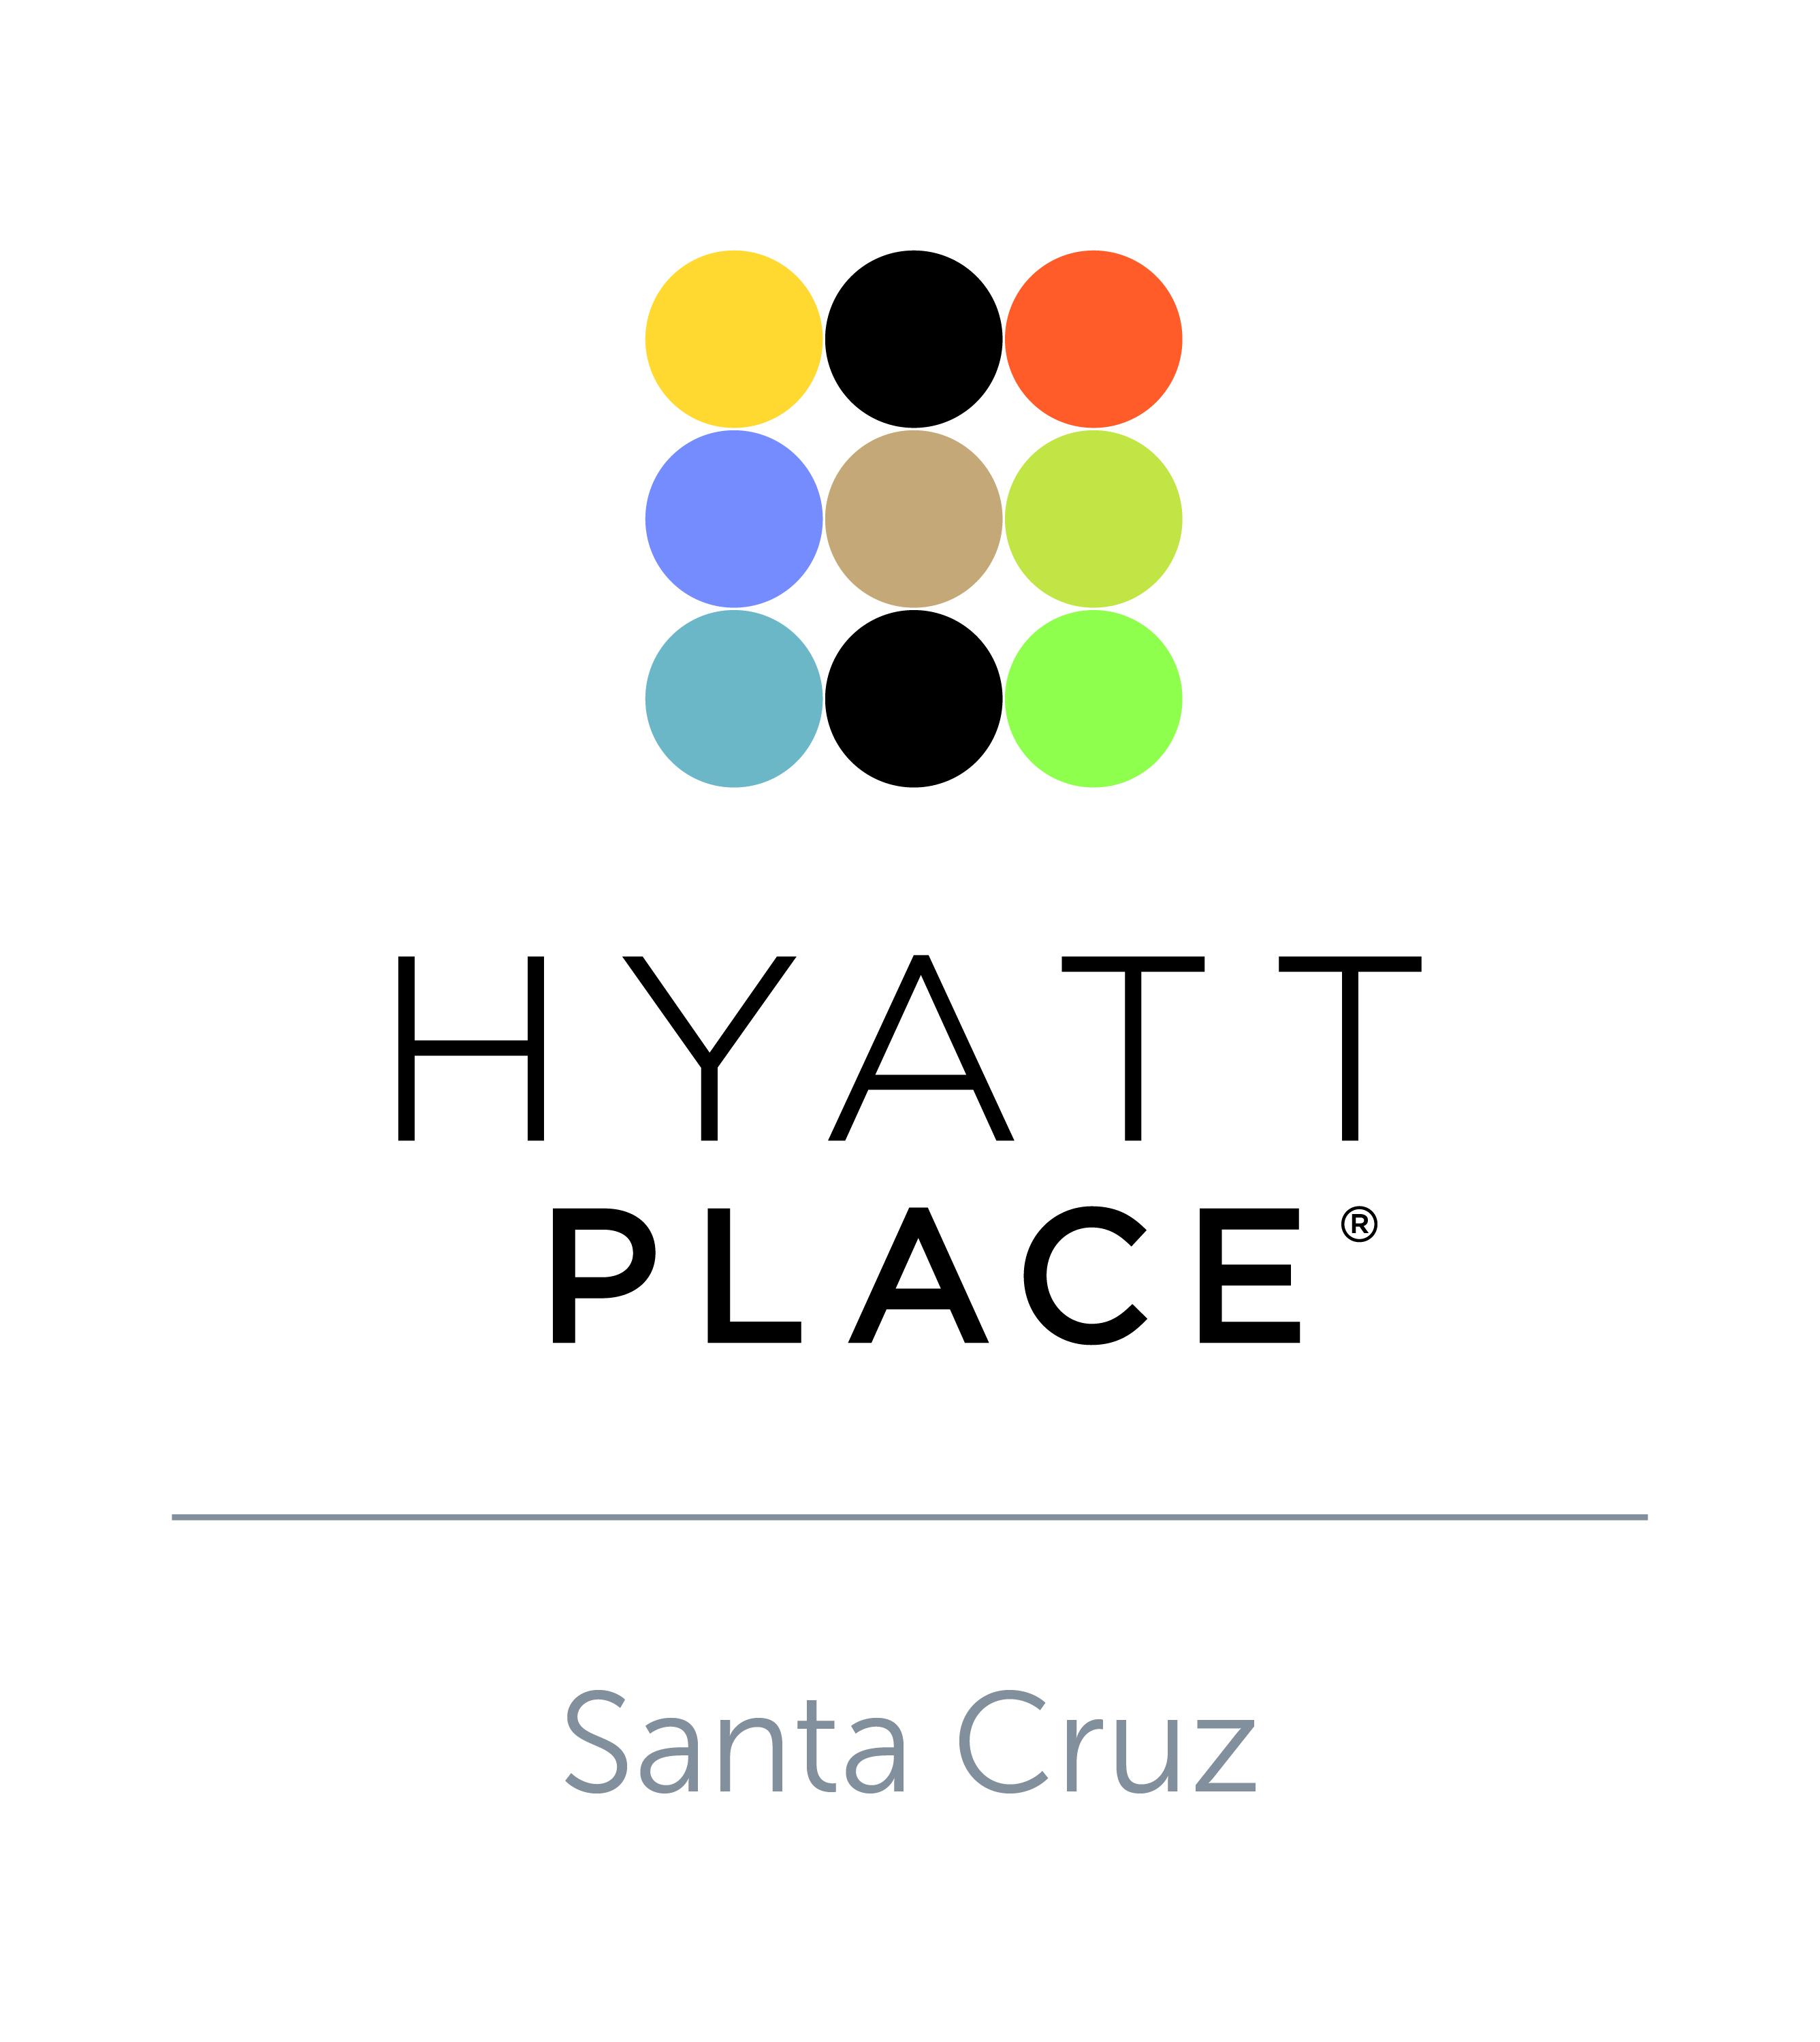 Hyatt Place Santa Cruz